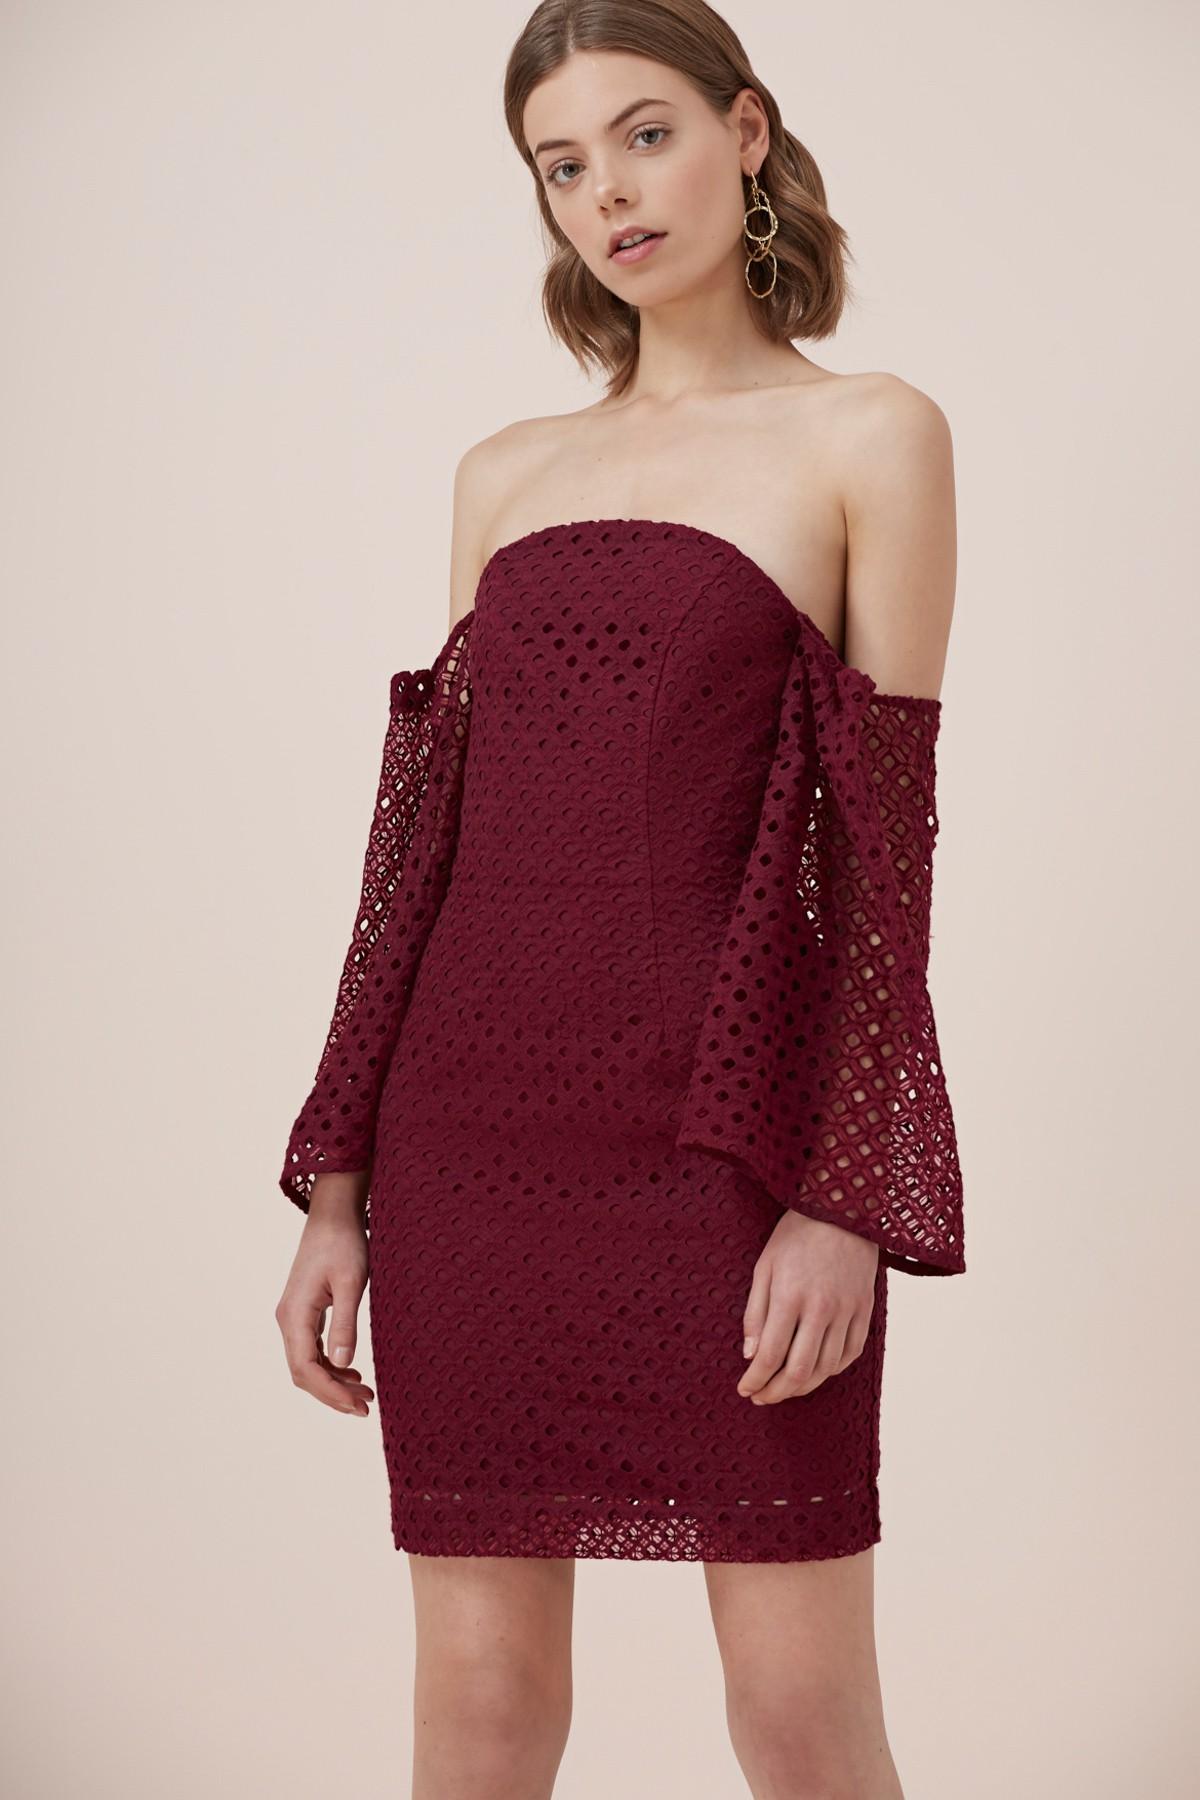 Keepsake The Label Last Dance Mini Dress